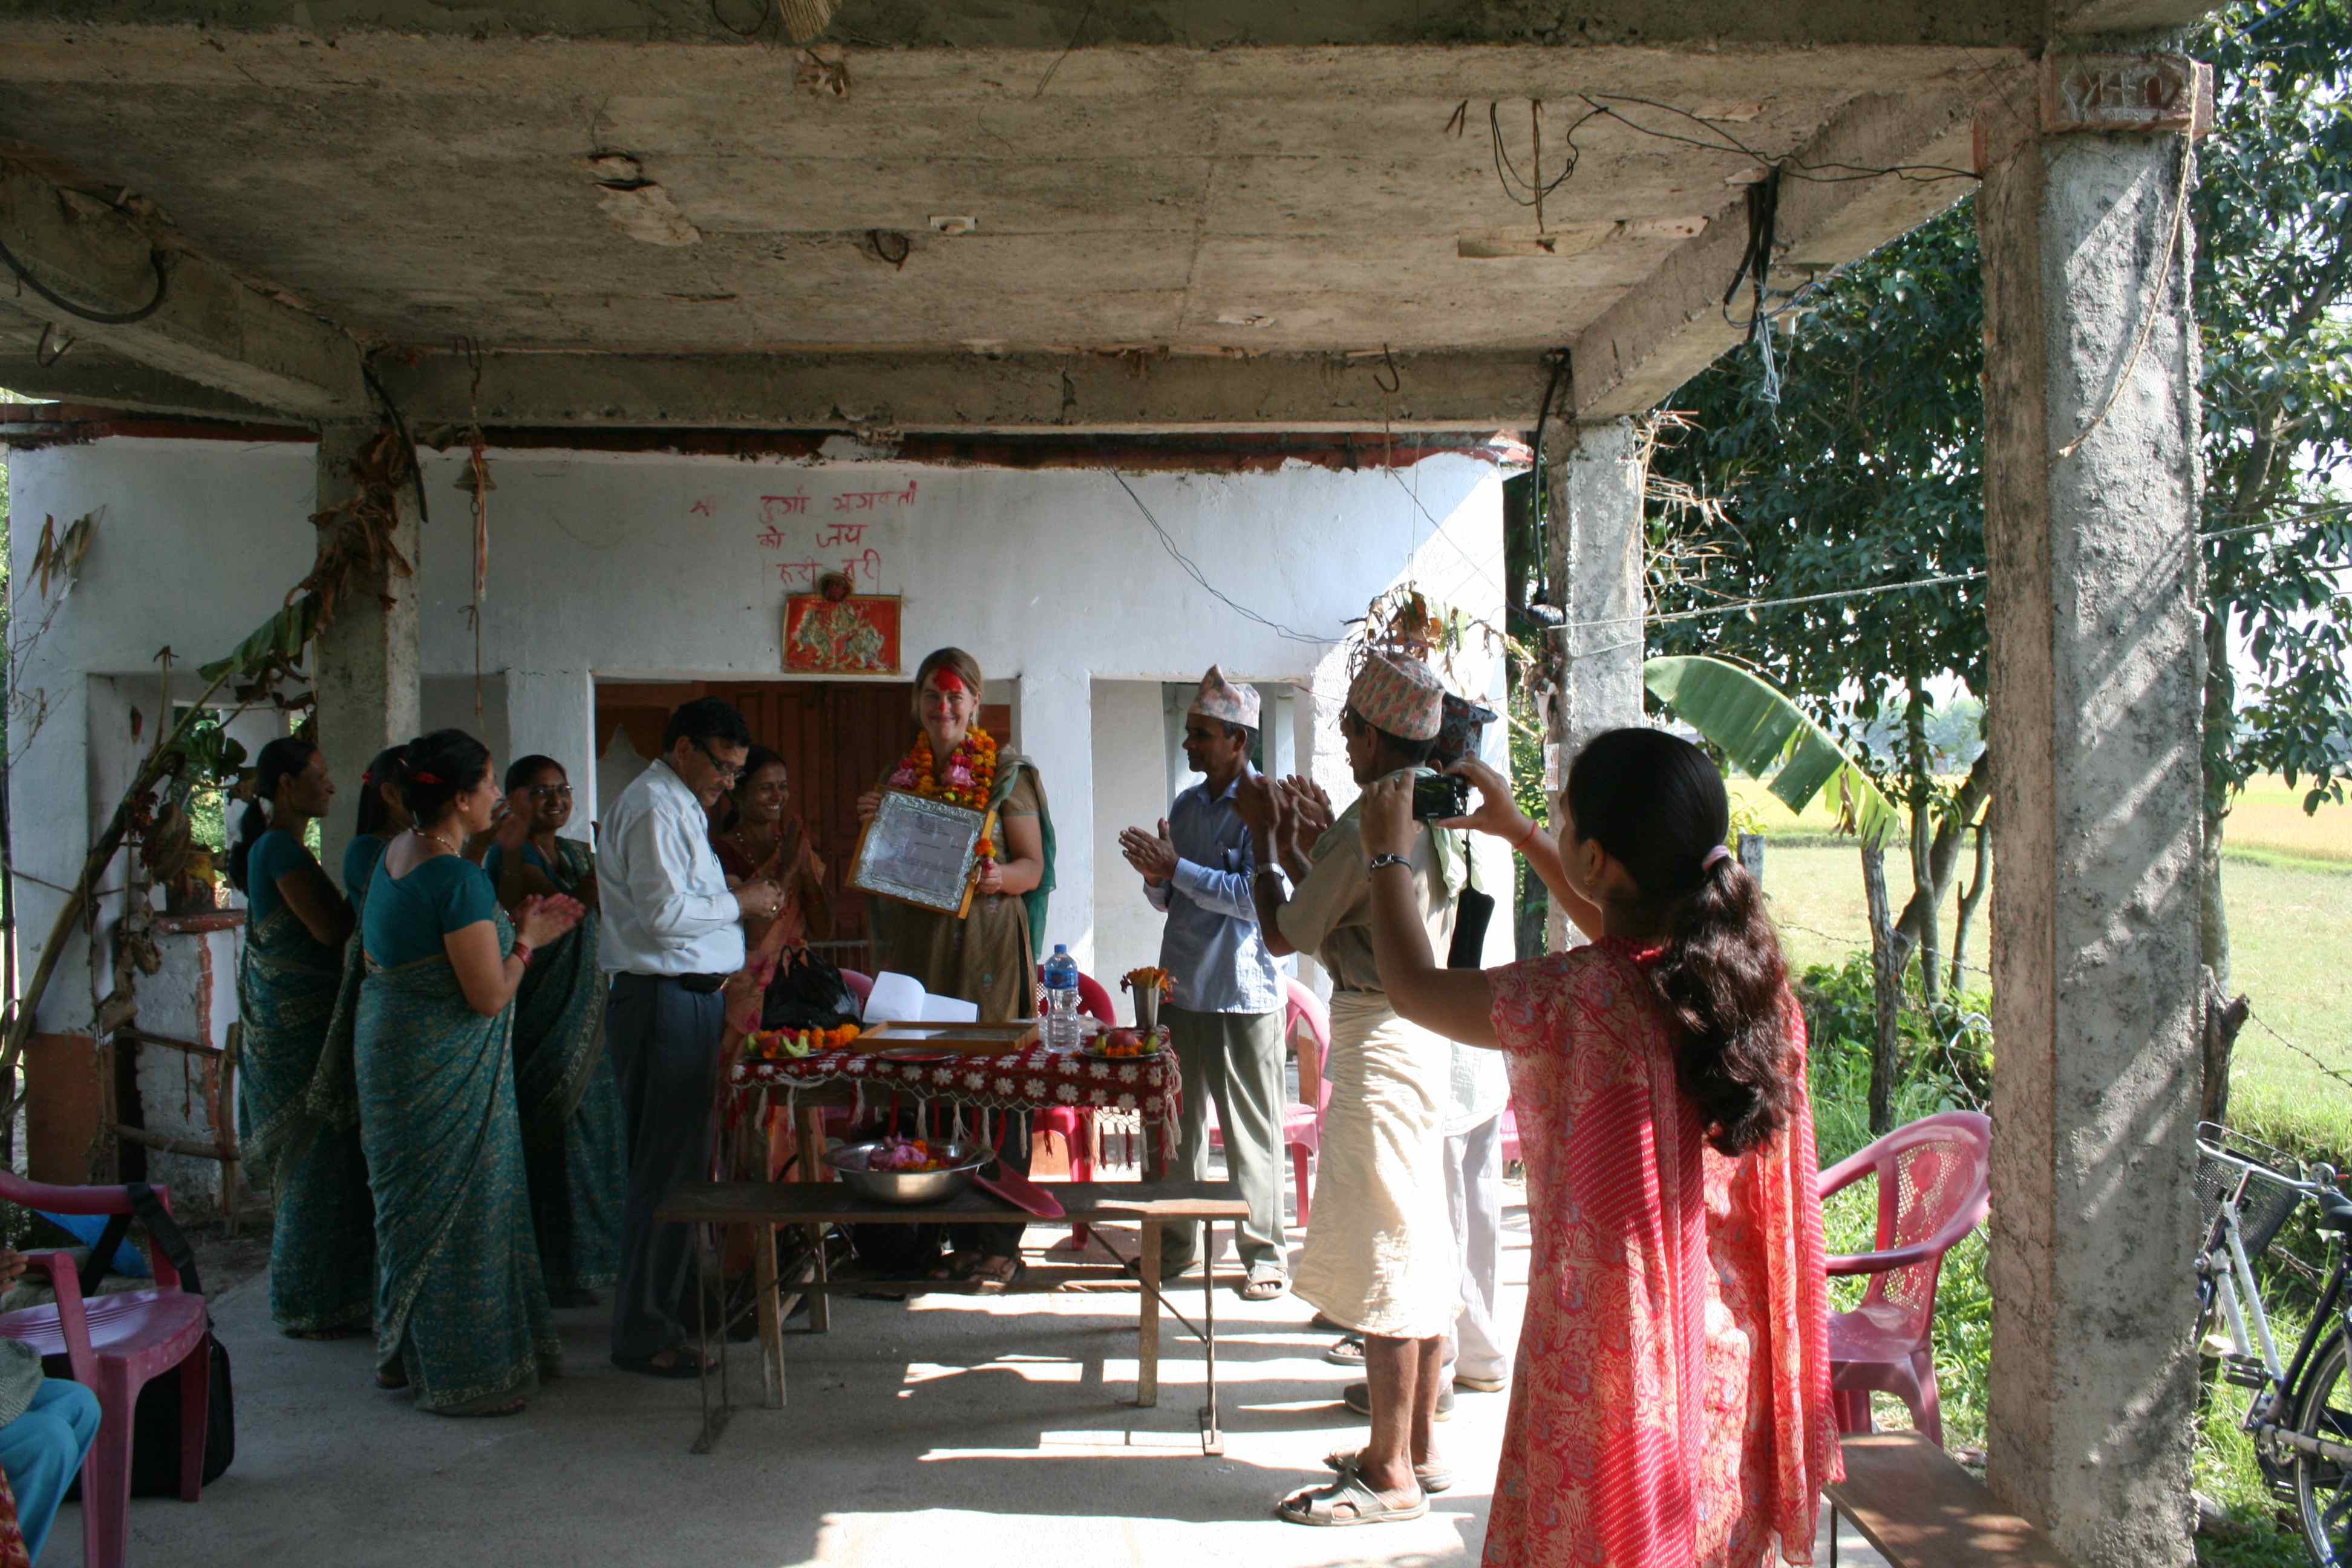 Udenfor Shanti Priya Primary school foran det lille tempel